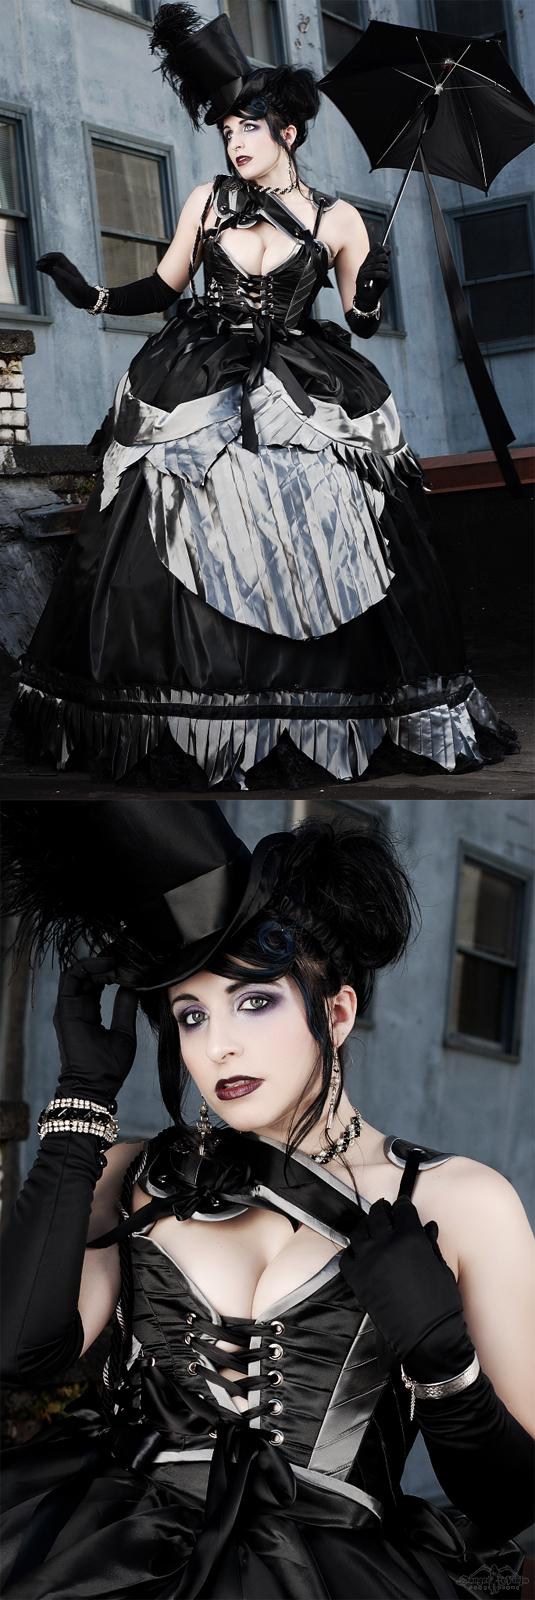 Jun 07, 2009 Hair & makeup by me; outfit by Squeak Designs; photo by Danger Ninja